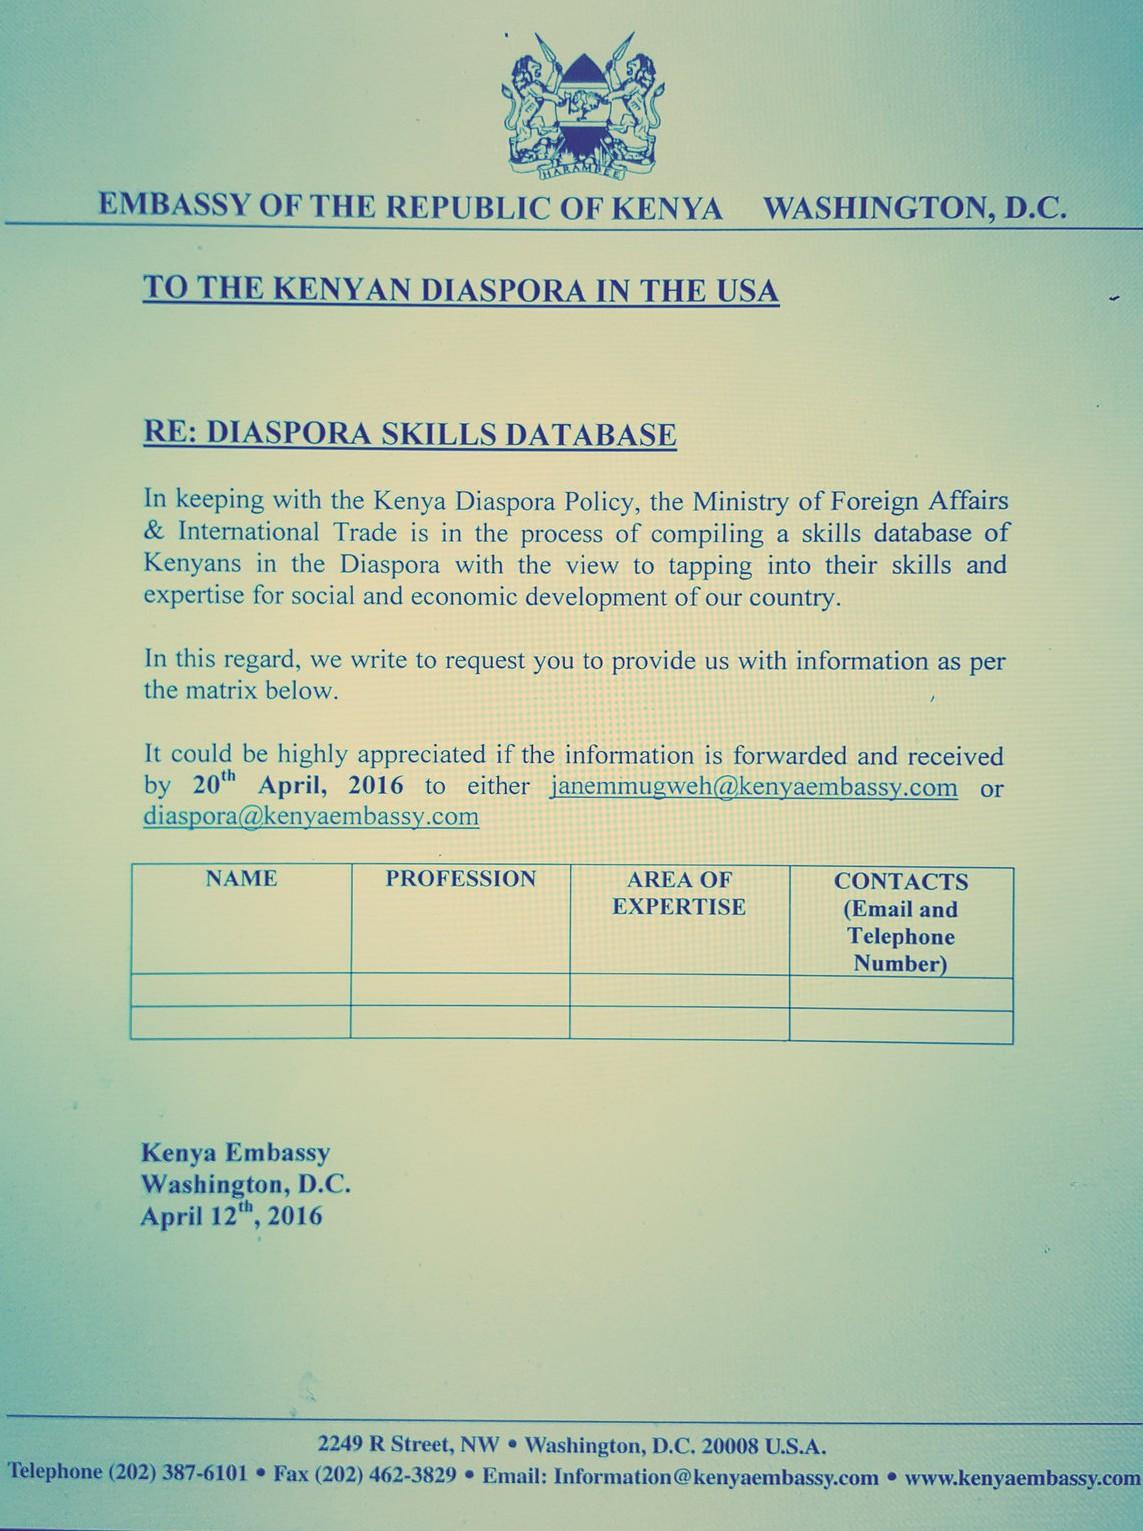 Kenya embassy us diaspora skills database samrack media for Consul database